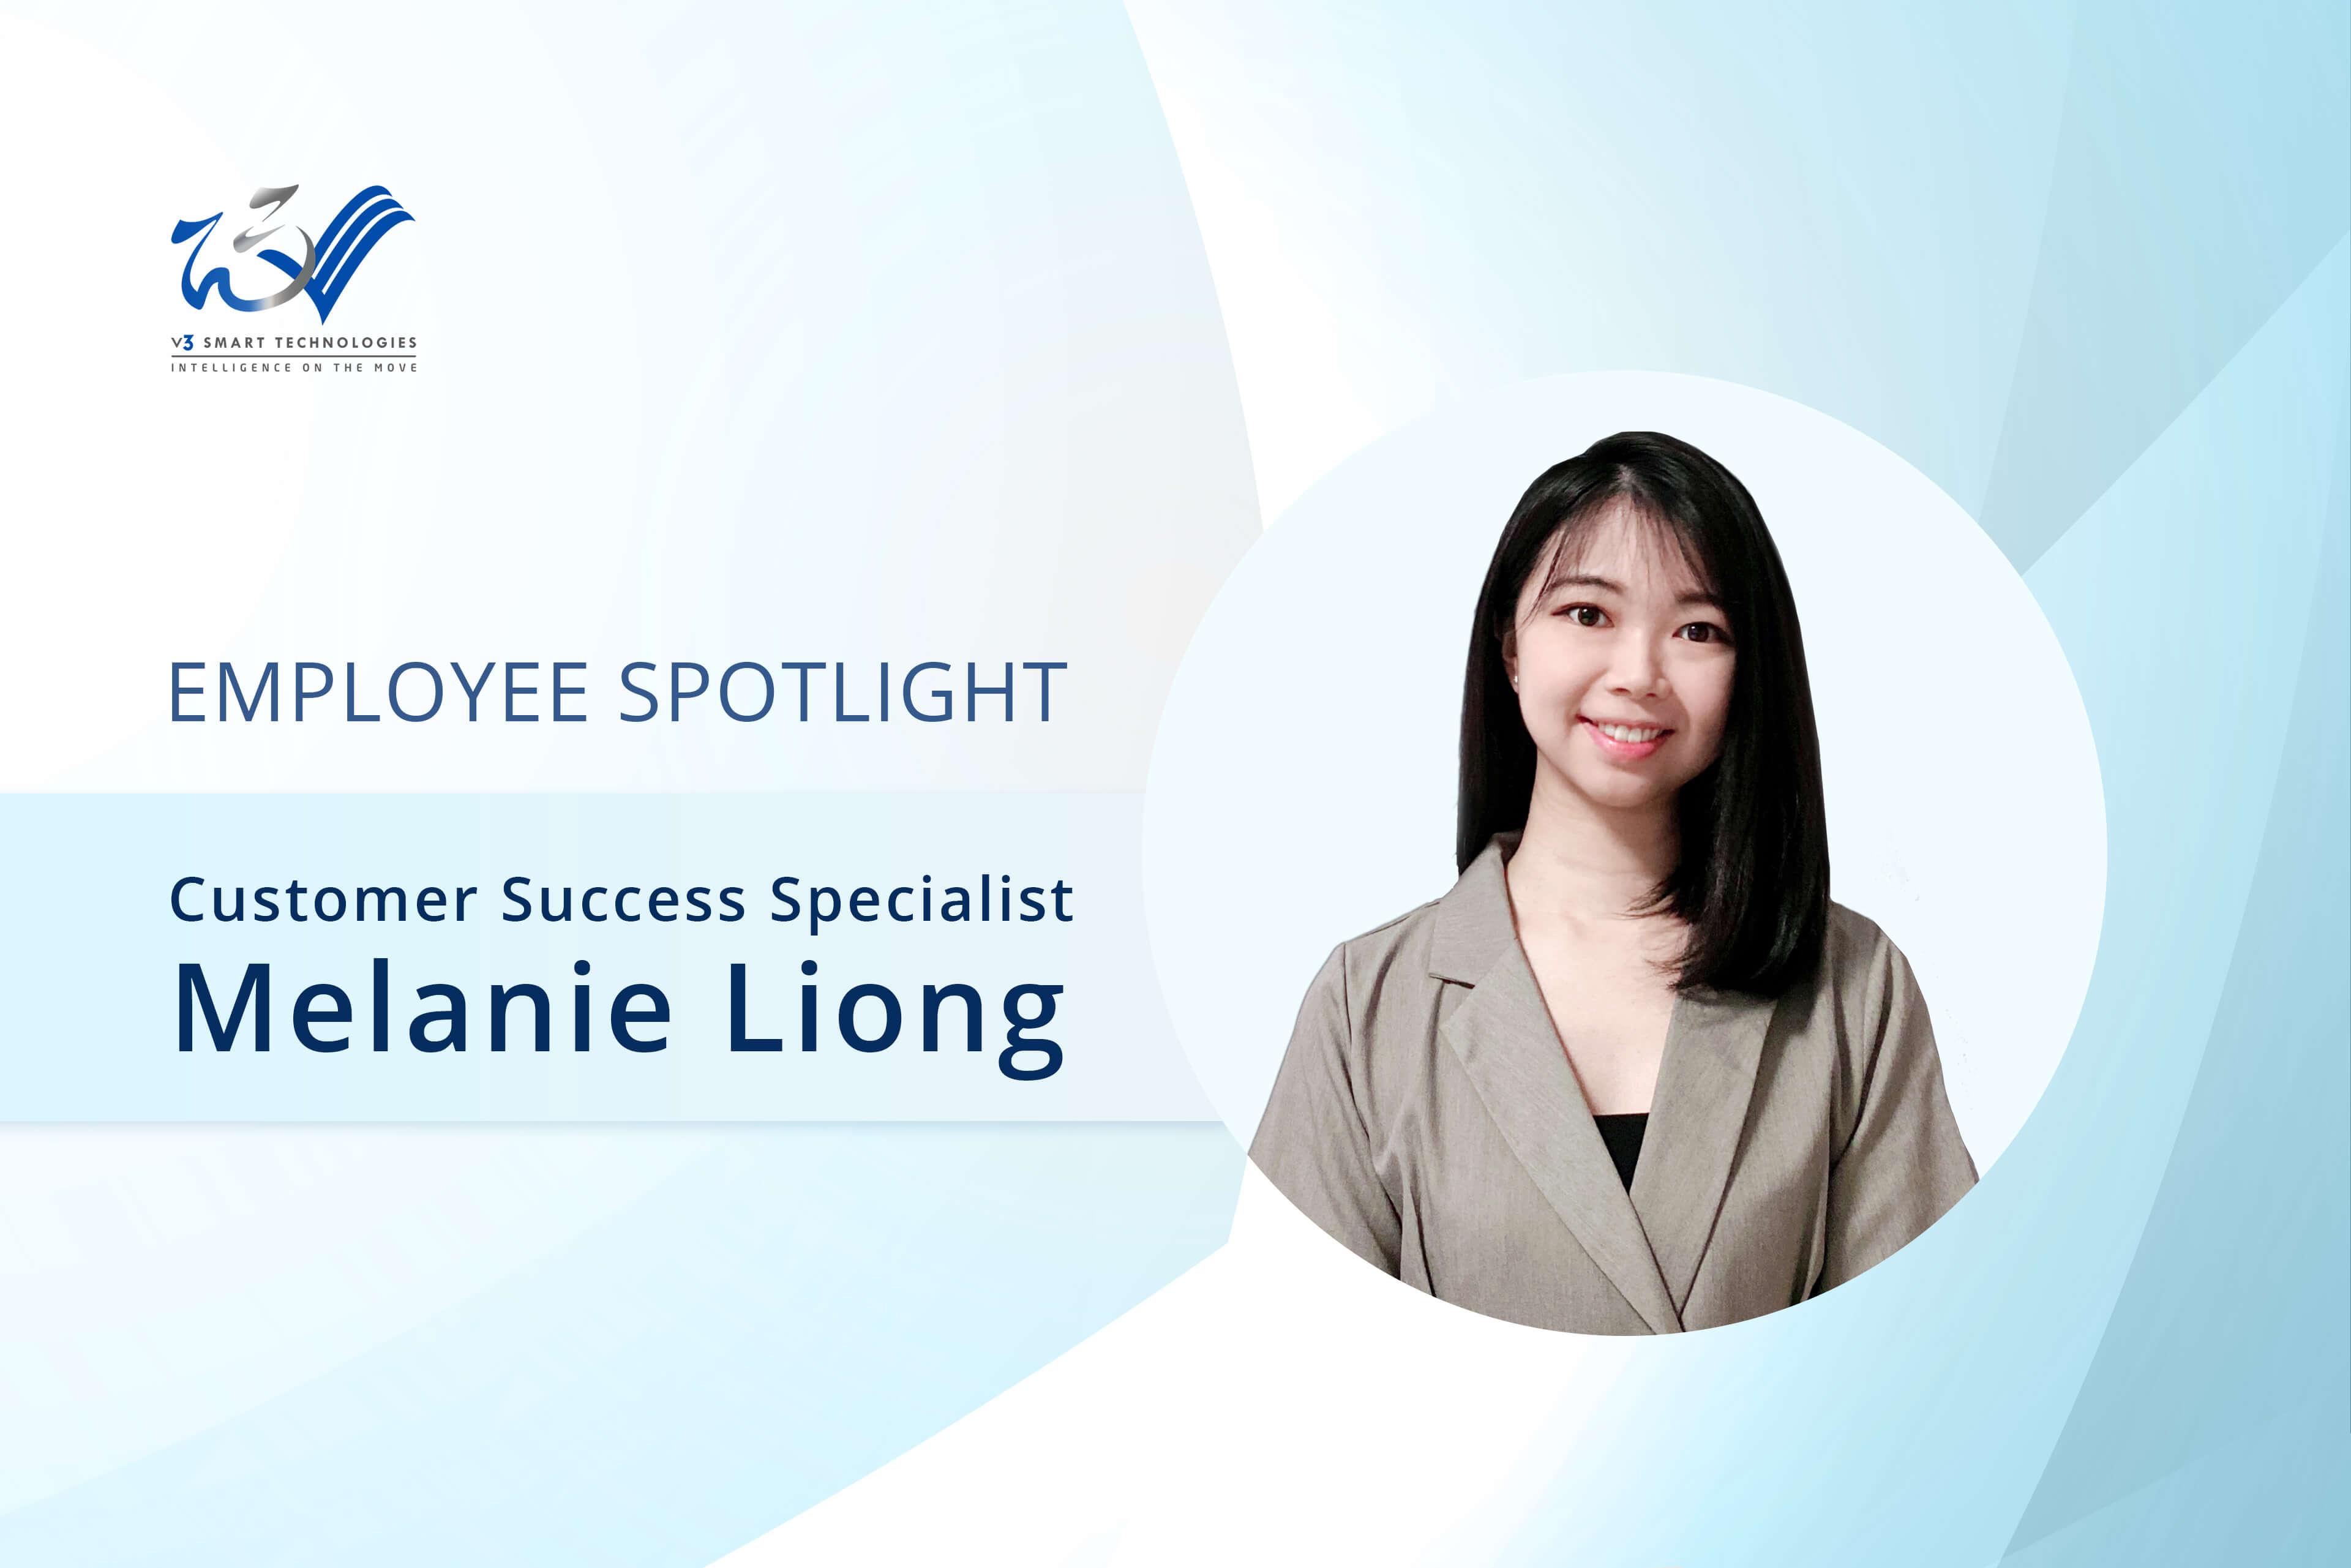 Employee Spotlight: Melanie Liong, Customer Success Specialist